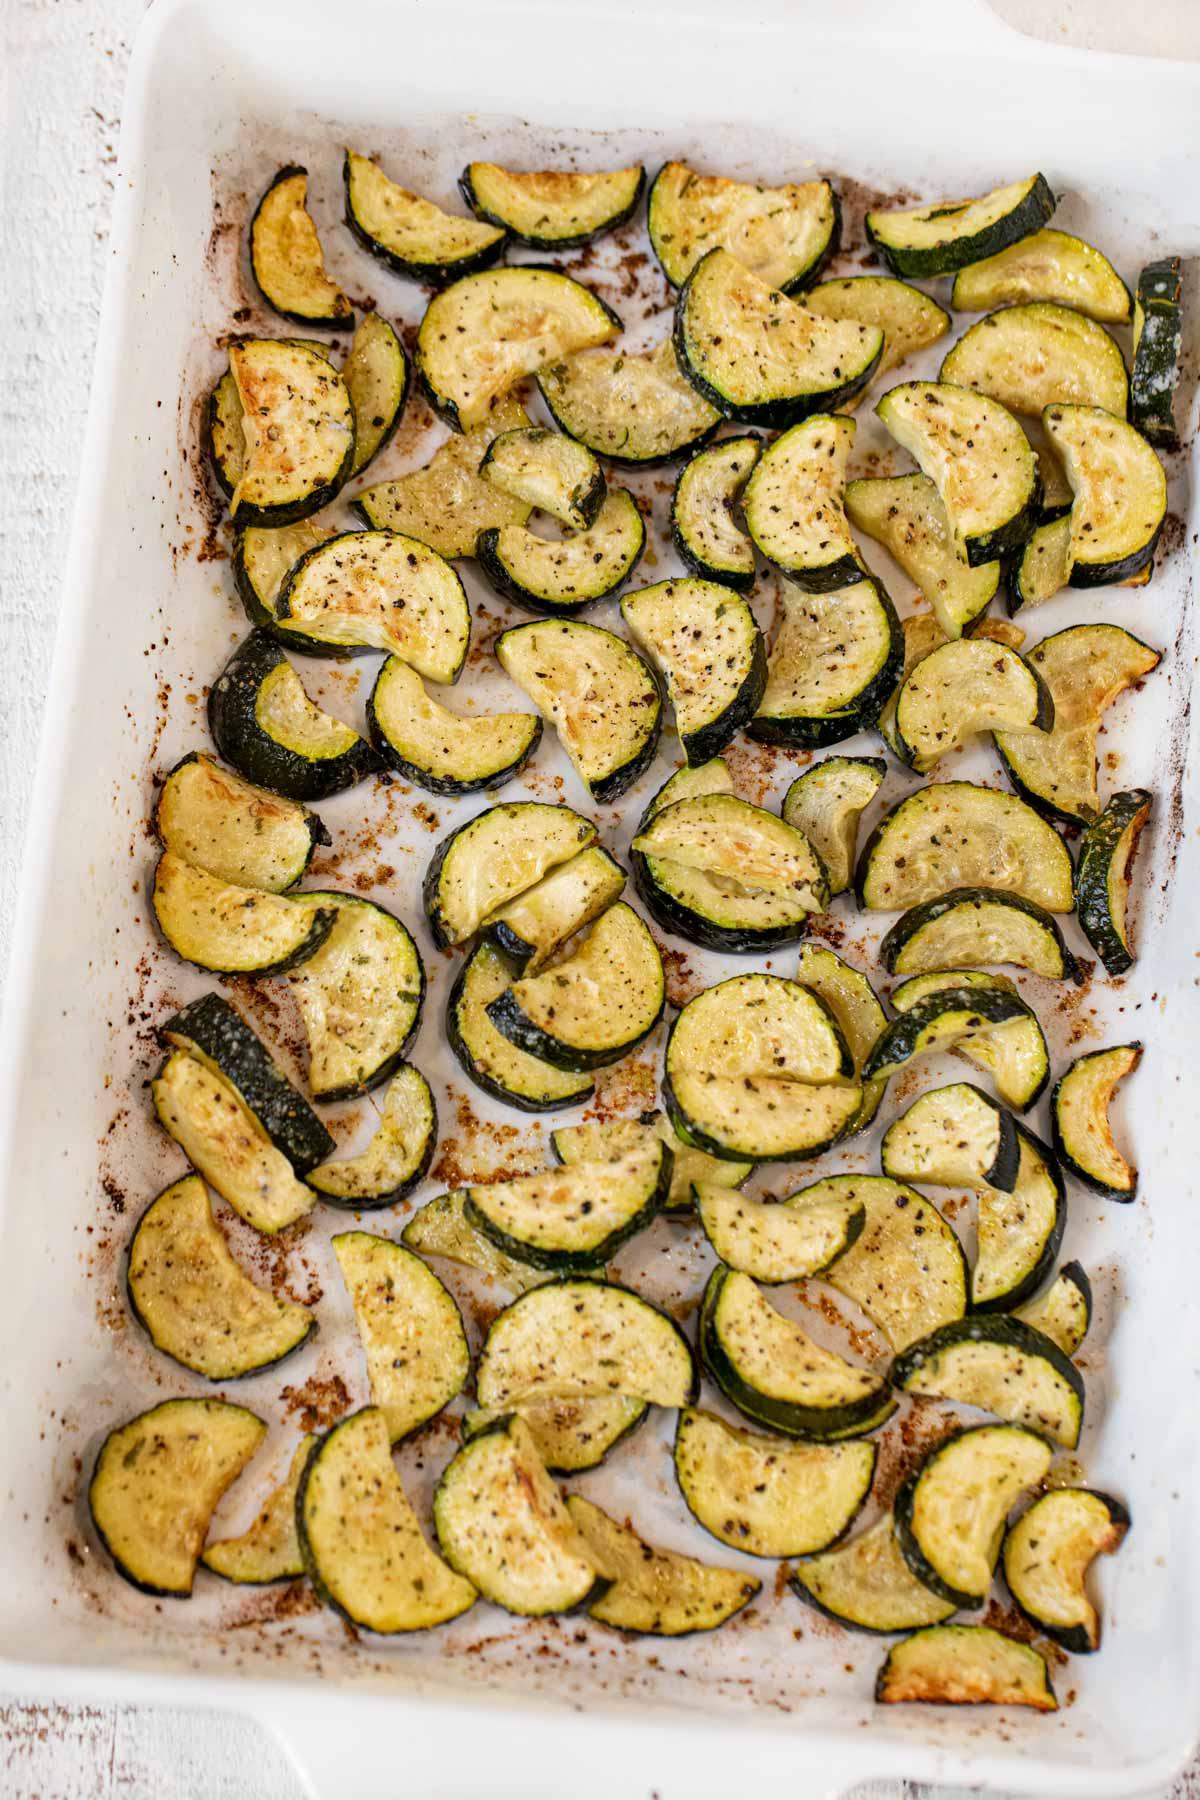 Roasted Zucchini in baking dish